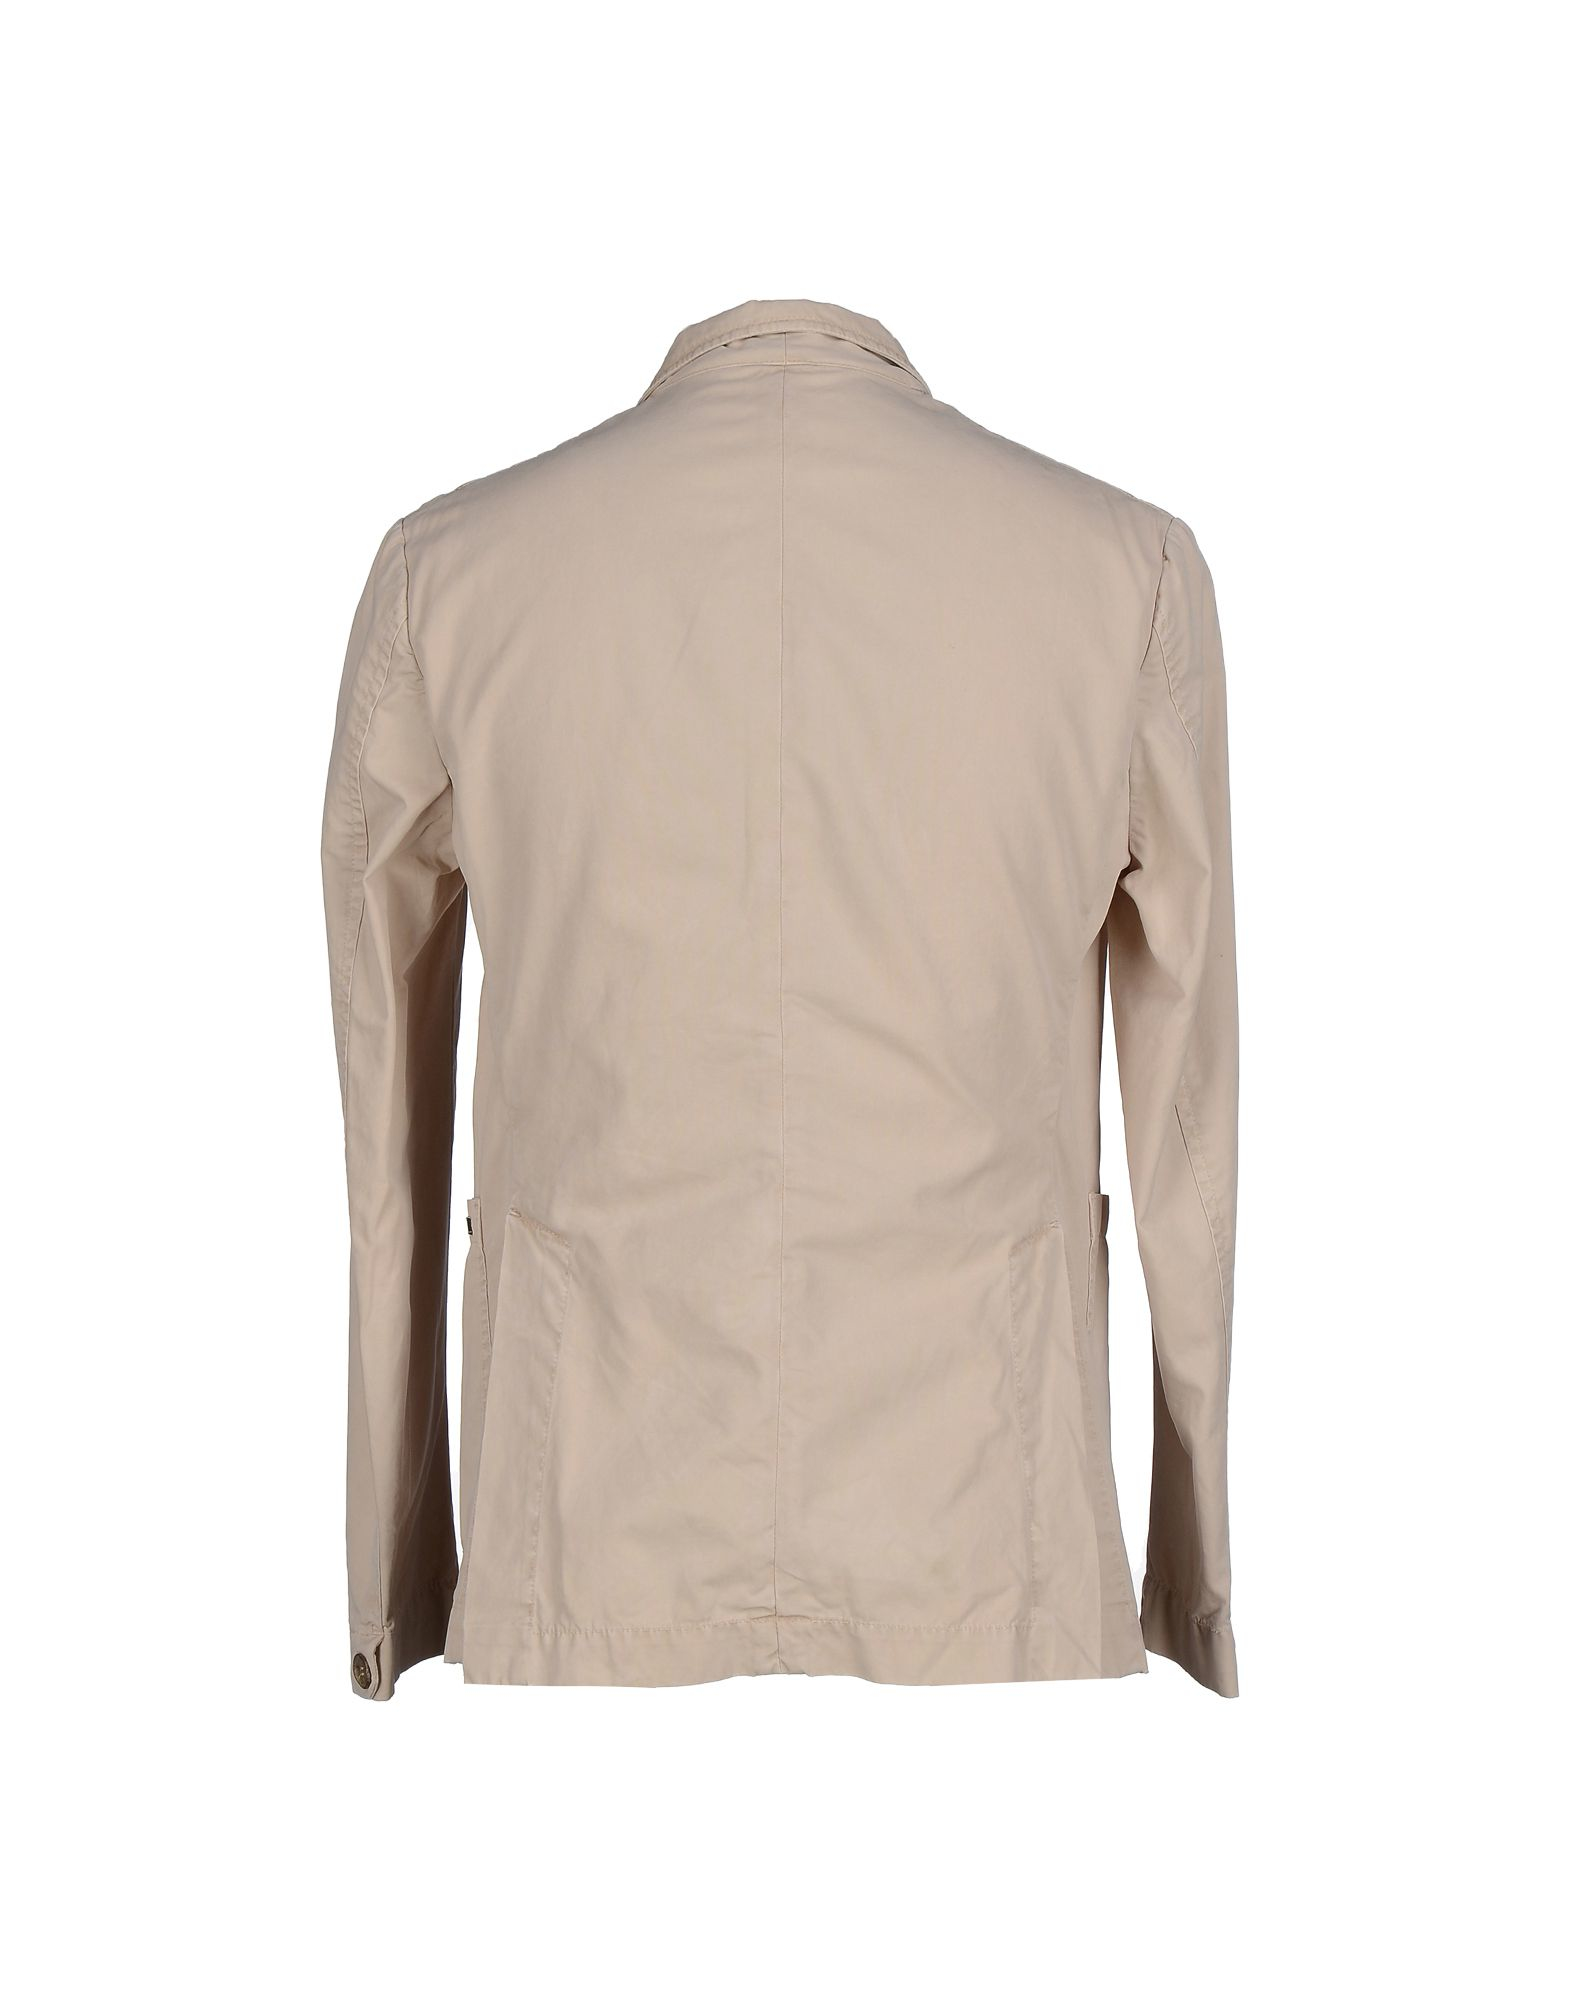 Mason 39 s blazer in beige for men lyst for Mason s men s shirts